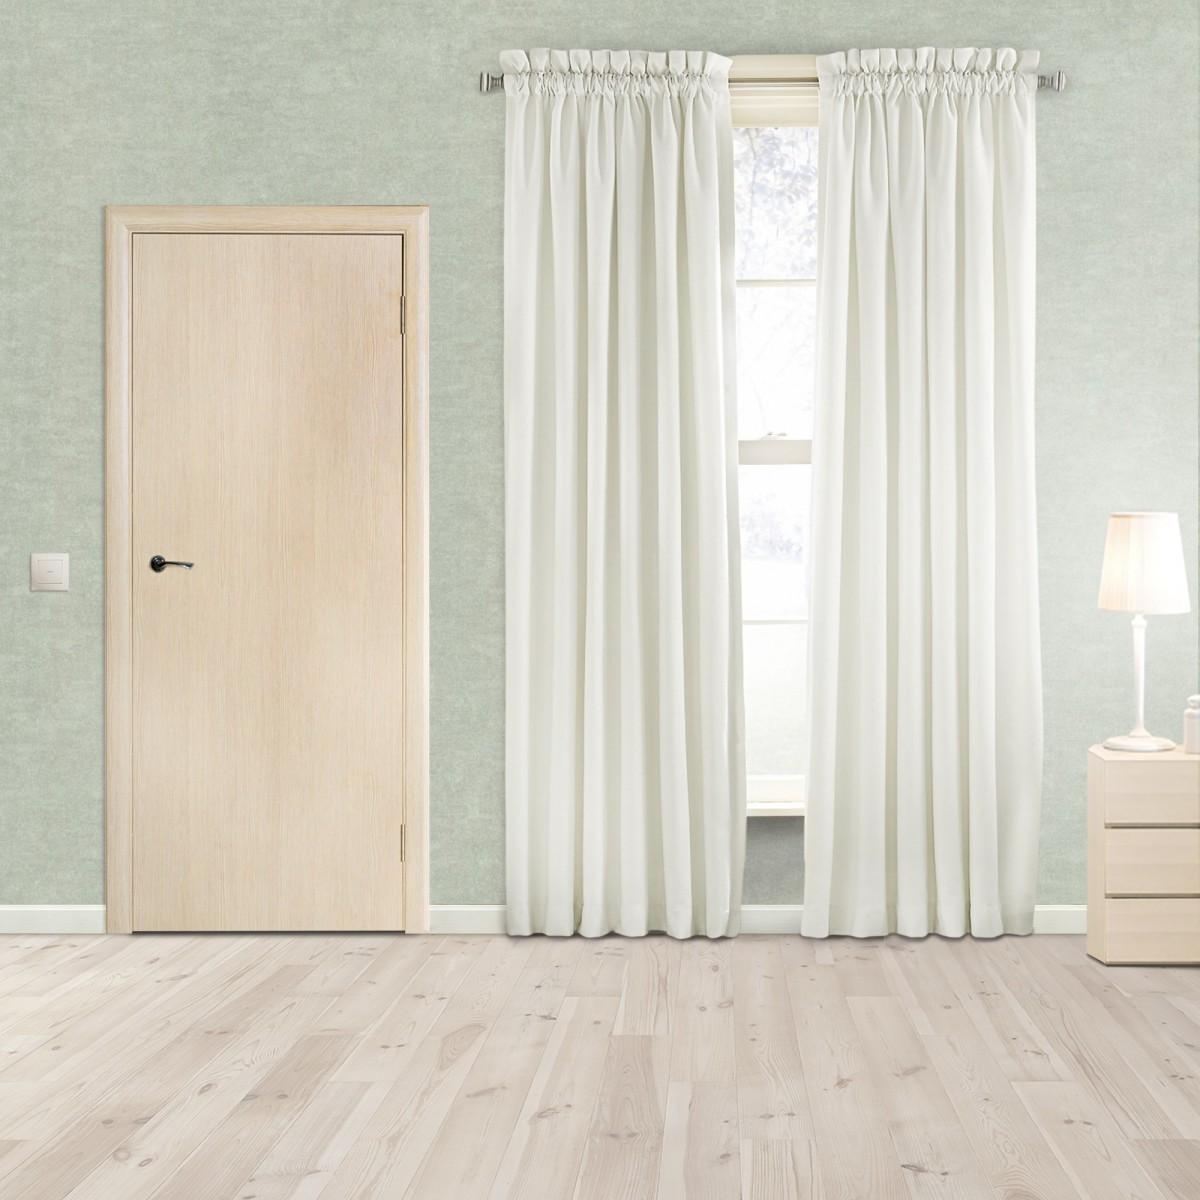 Дверь Межкомнатная Глухая Аура 90x200 Ламинация Цвет Ясень 3d